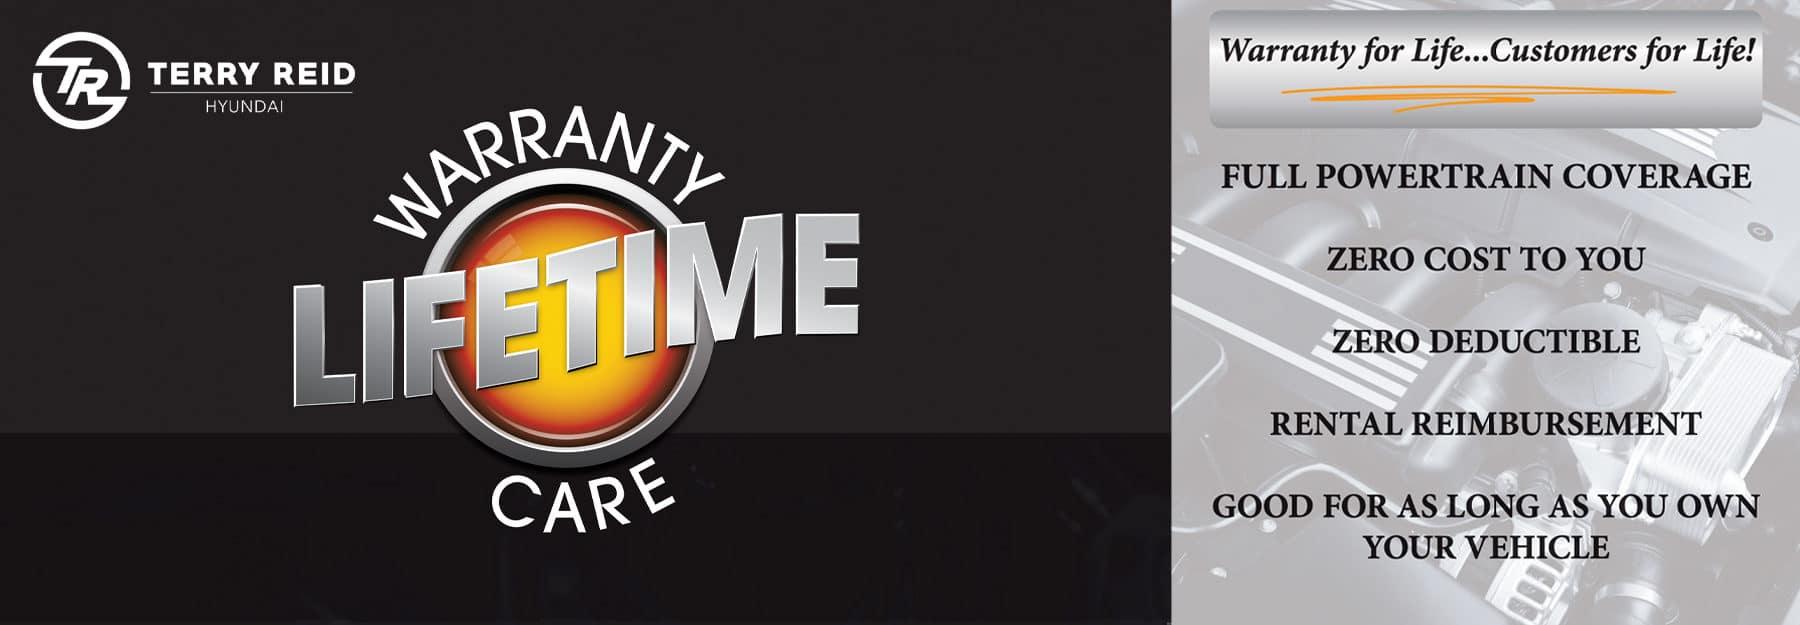 Lifetime Warranty Care